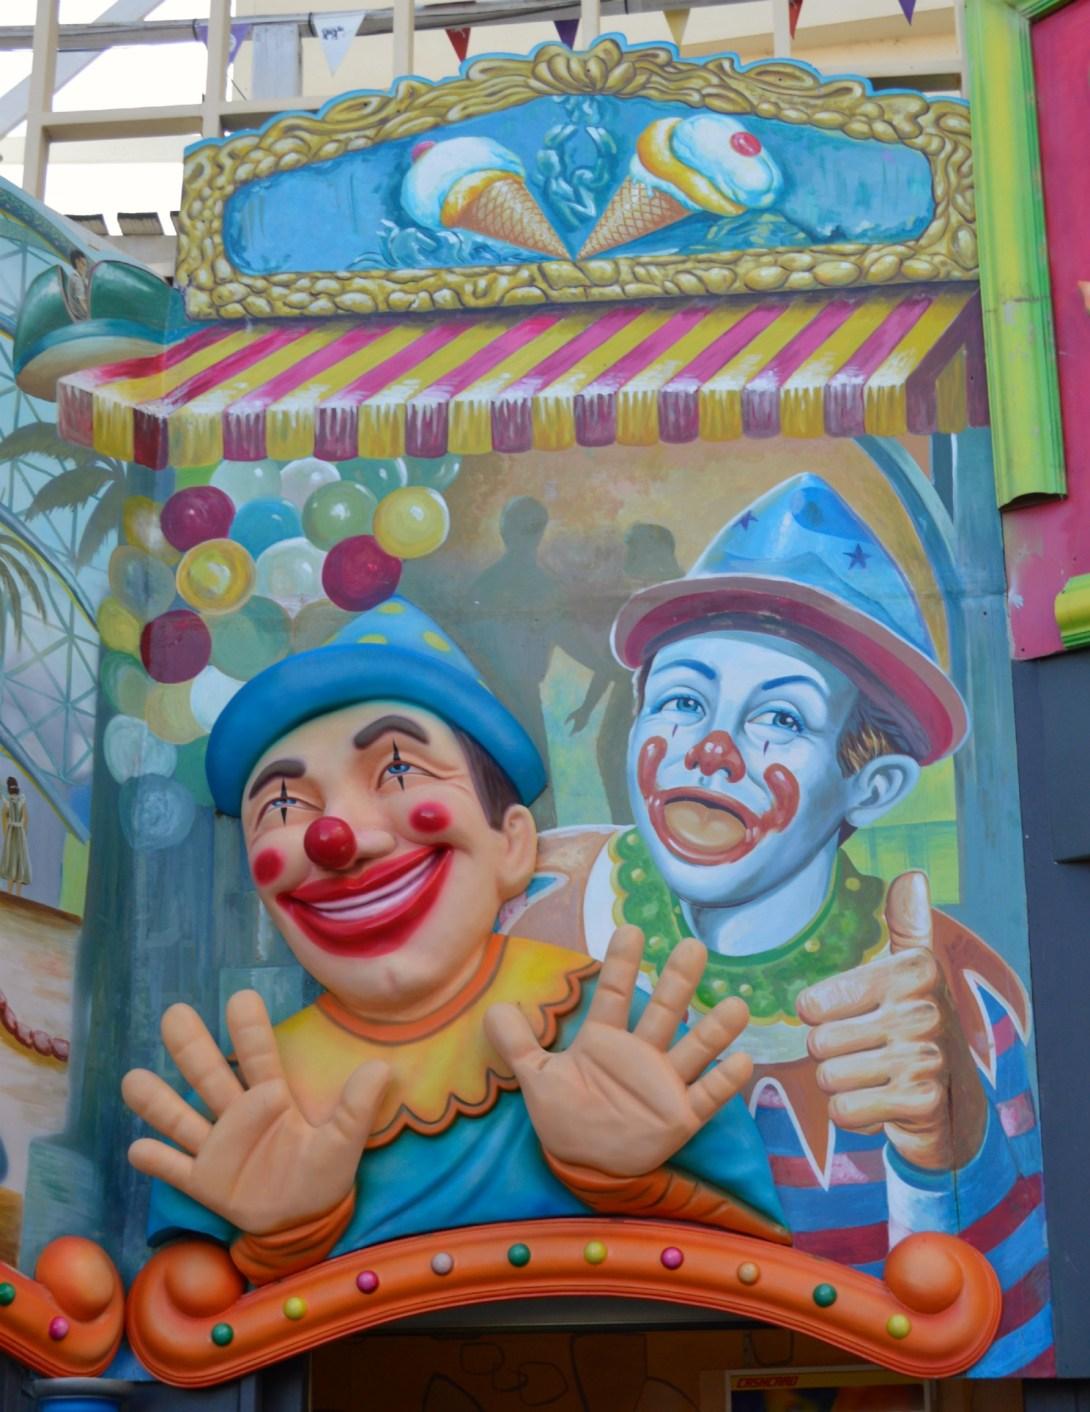 #Clown #kitsch #lunapark #melbourne #australia